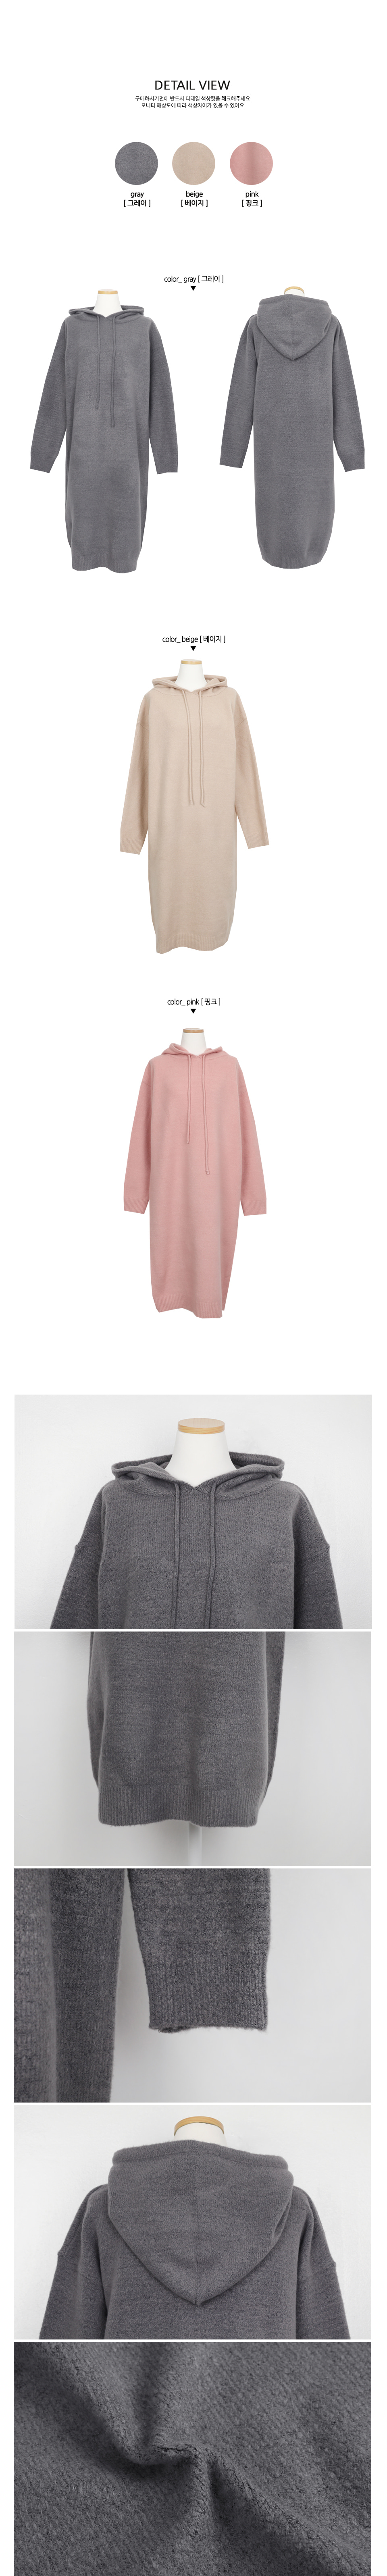 Morning Hooded Knit Dress